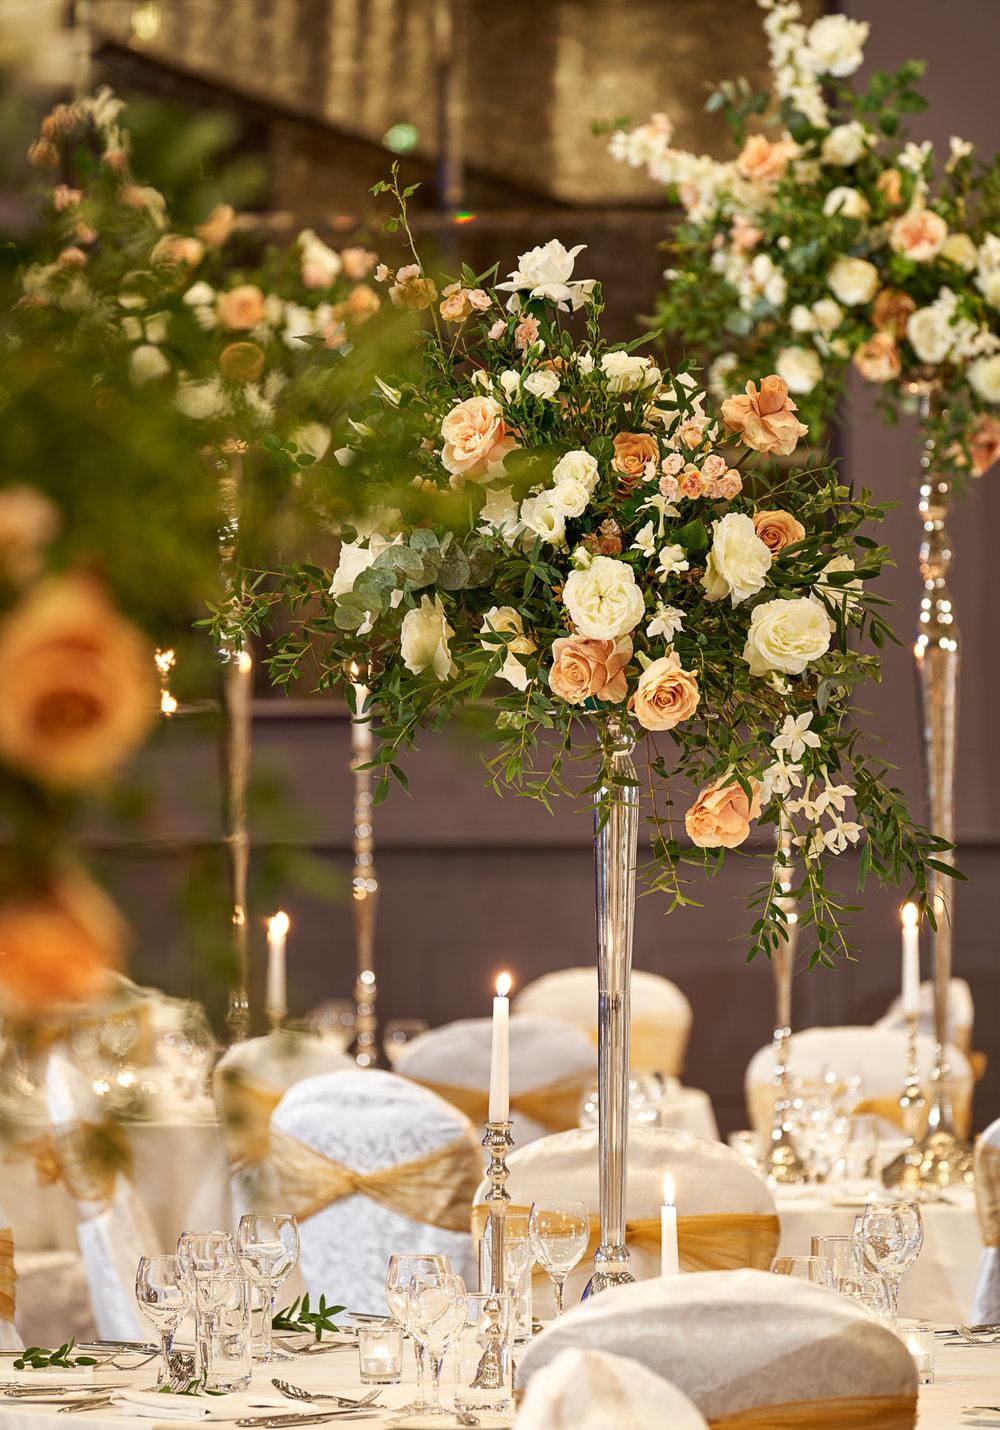 Galmont Wedding 9 2000px.jpg